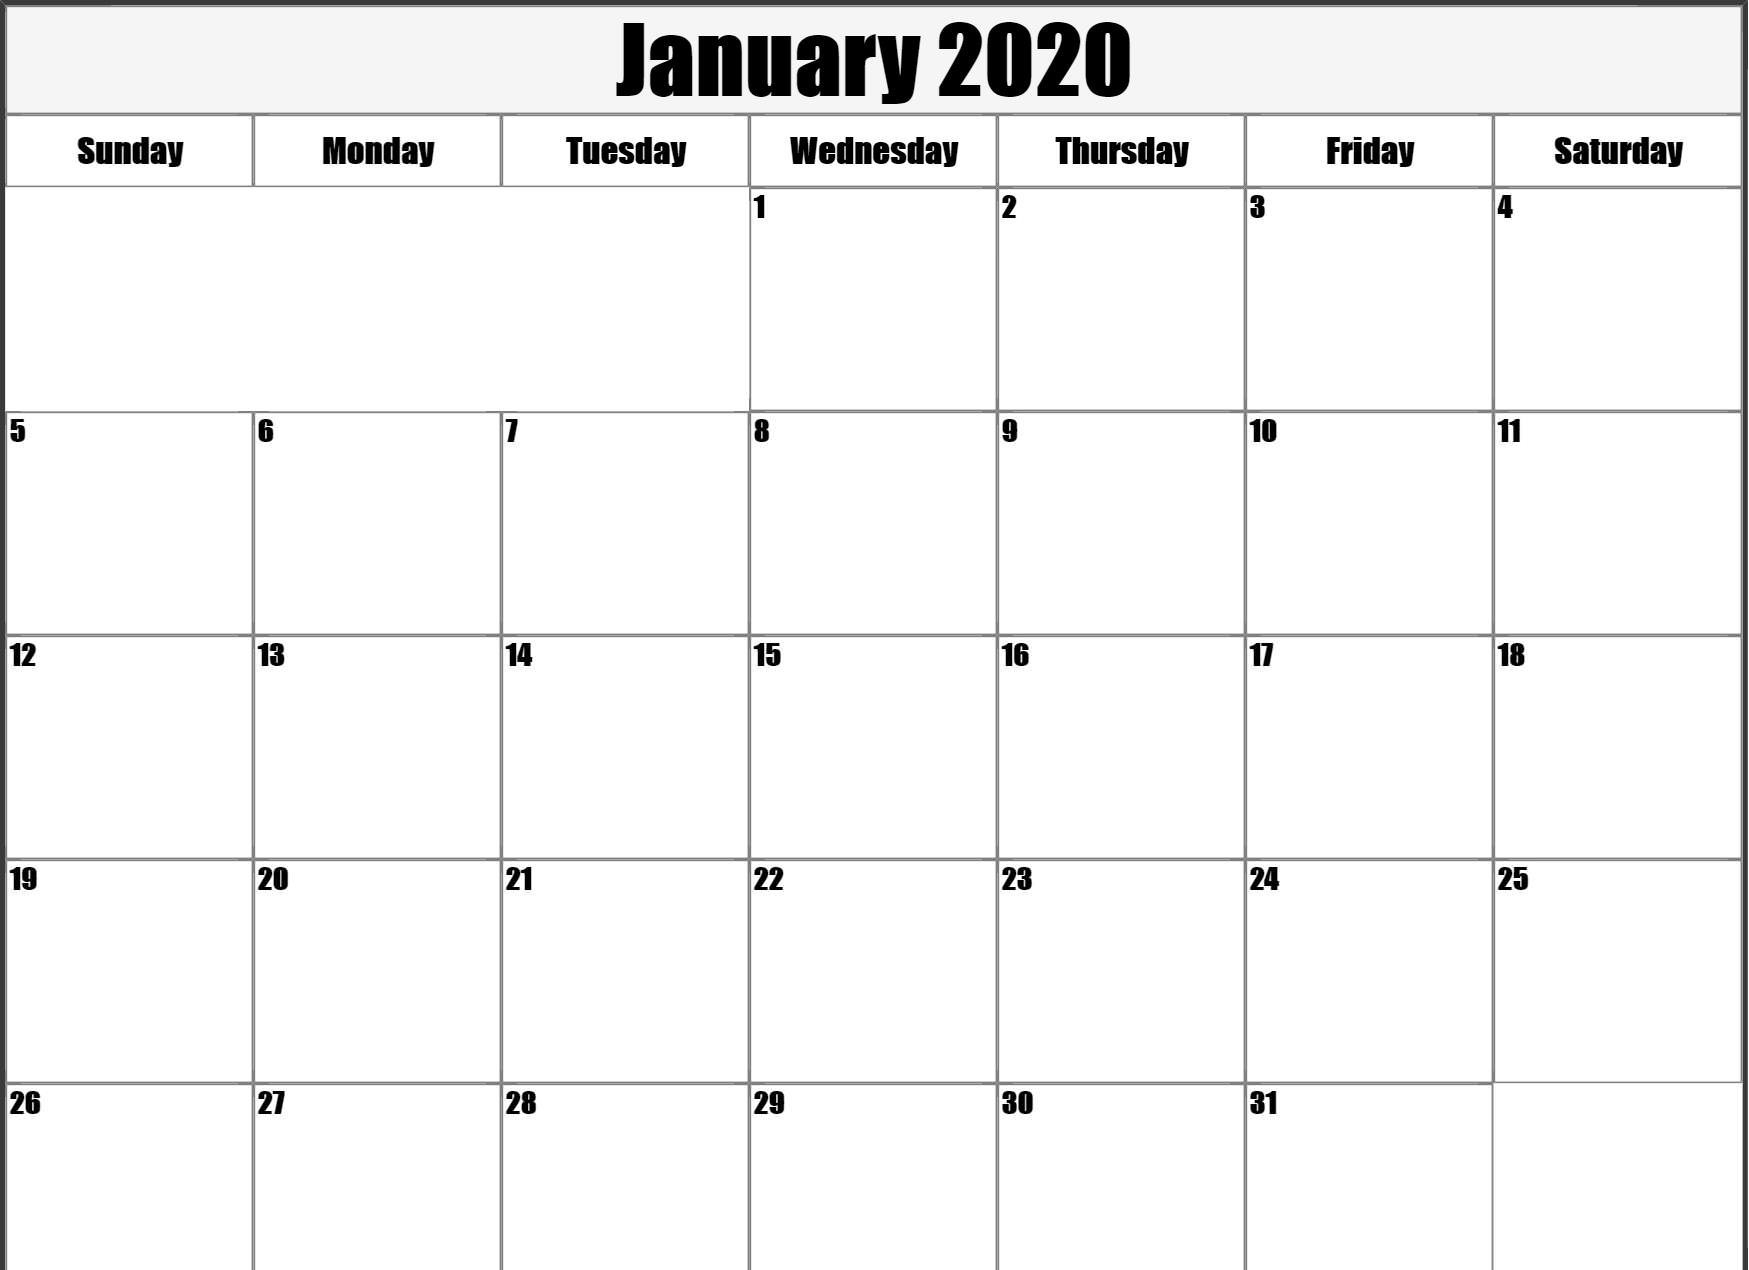 Free January 2020 Calendar Printable Template Blank